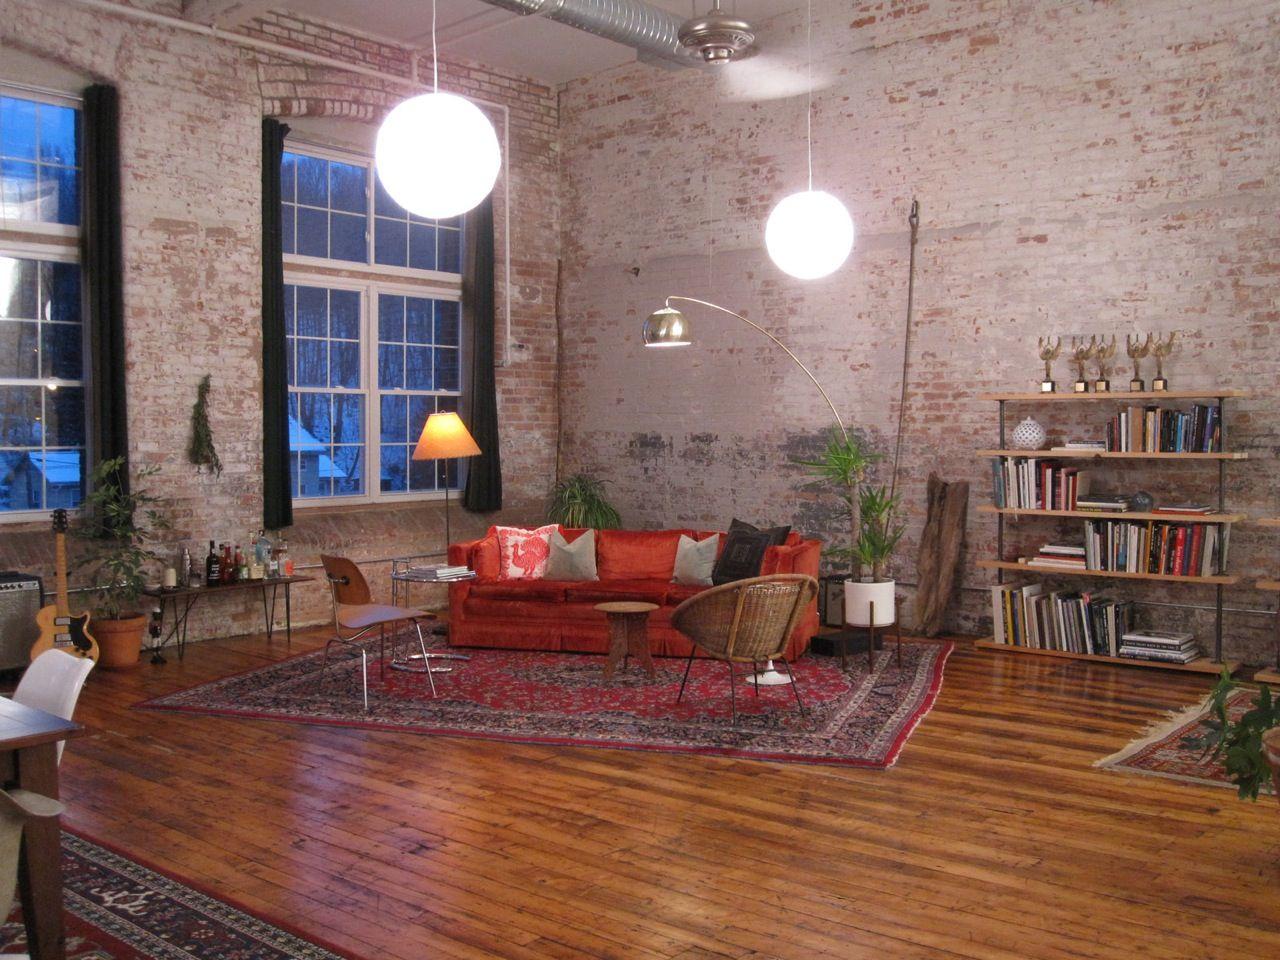 Big Loft Apartment Industrial Yet Homey Not Overdone Every - Loft apartment brick